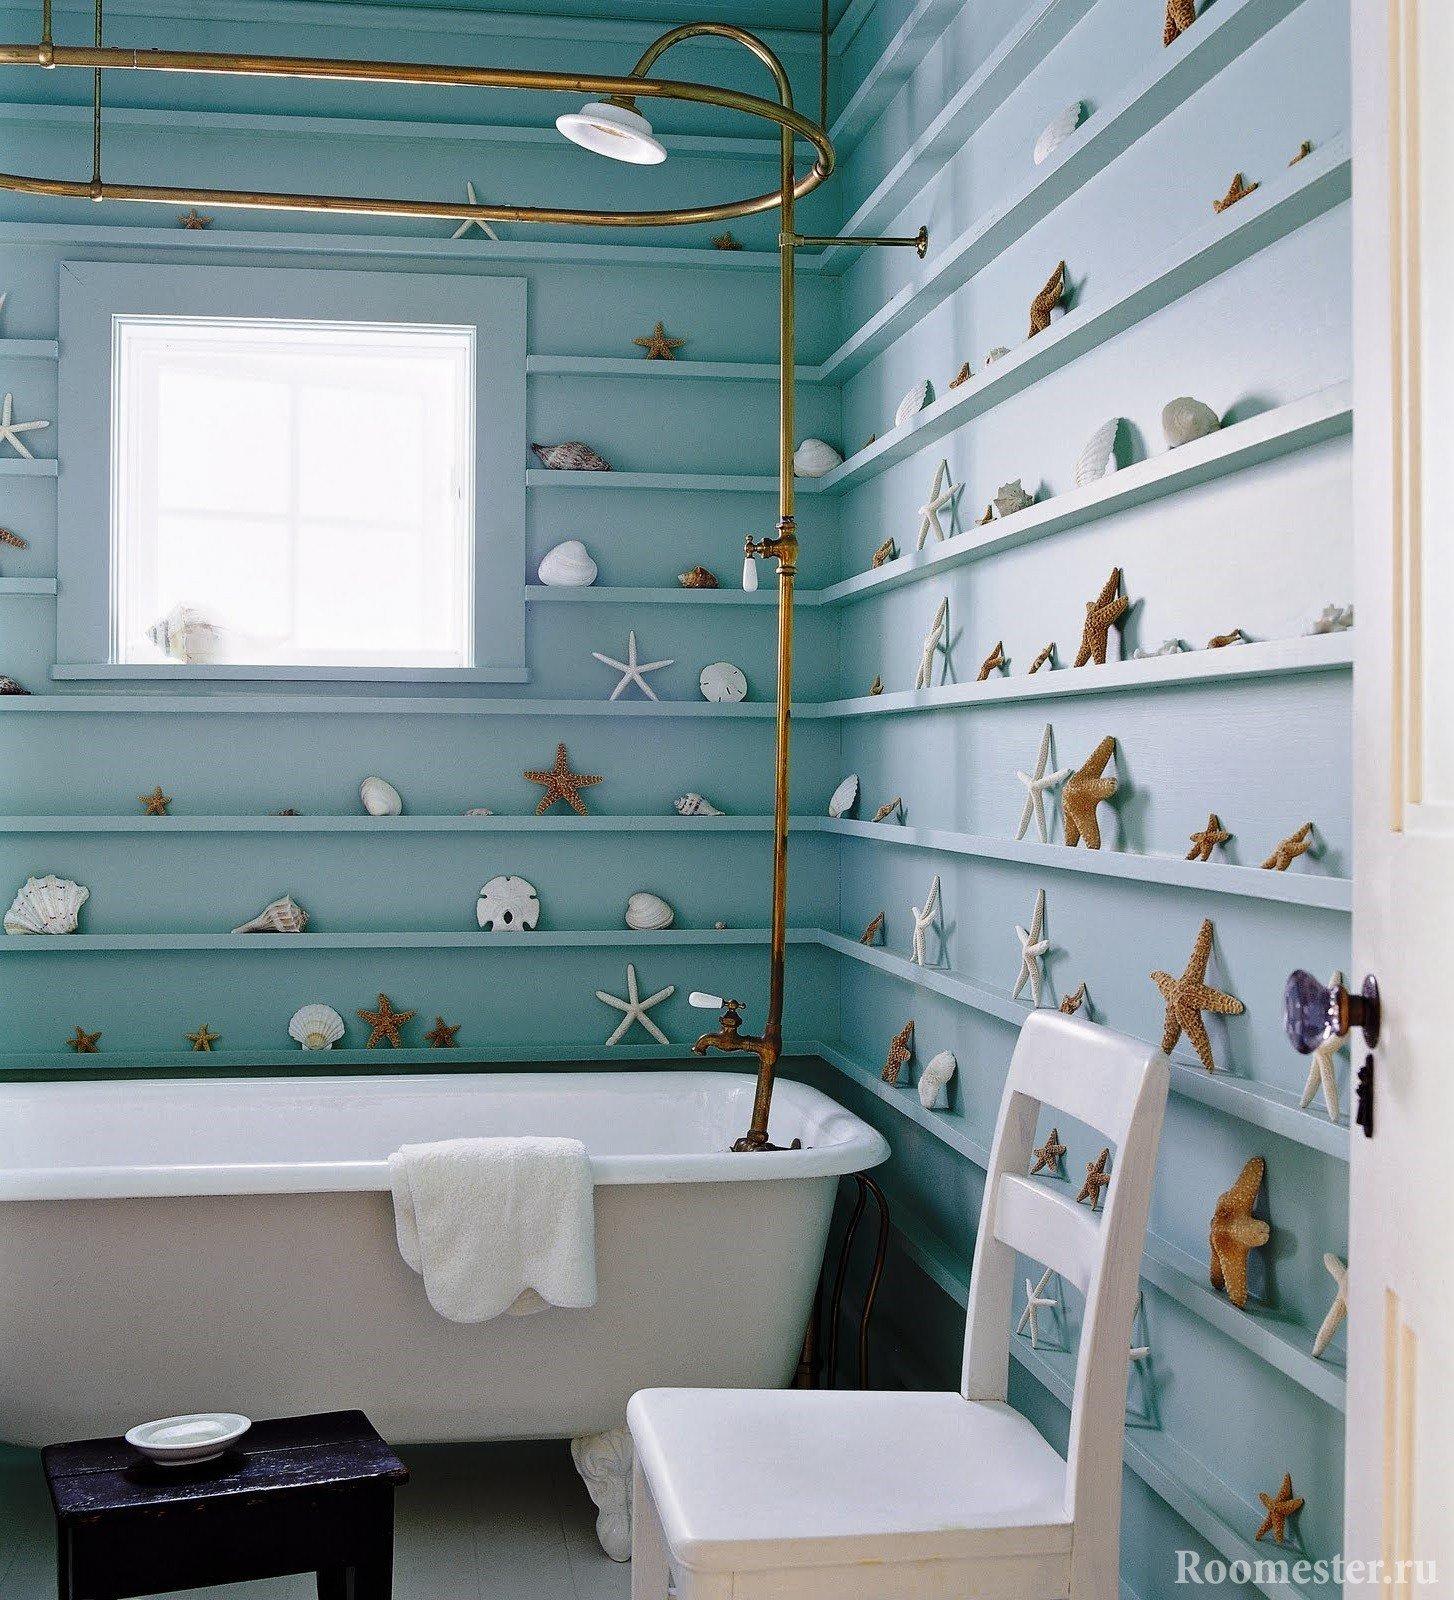 Seashells on the walls